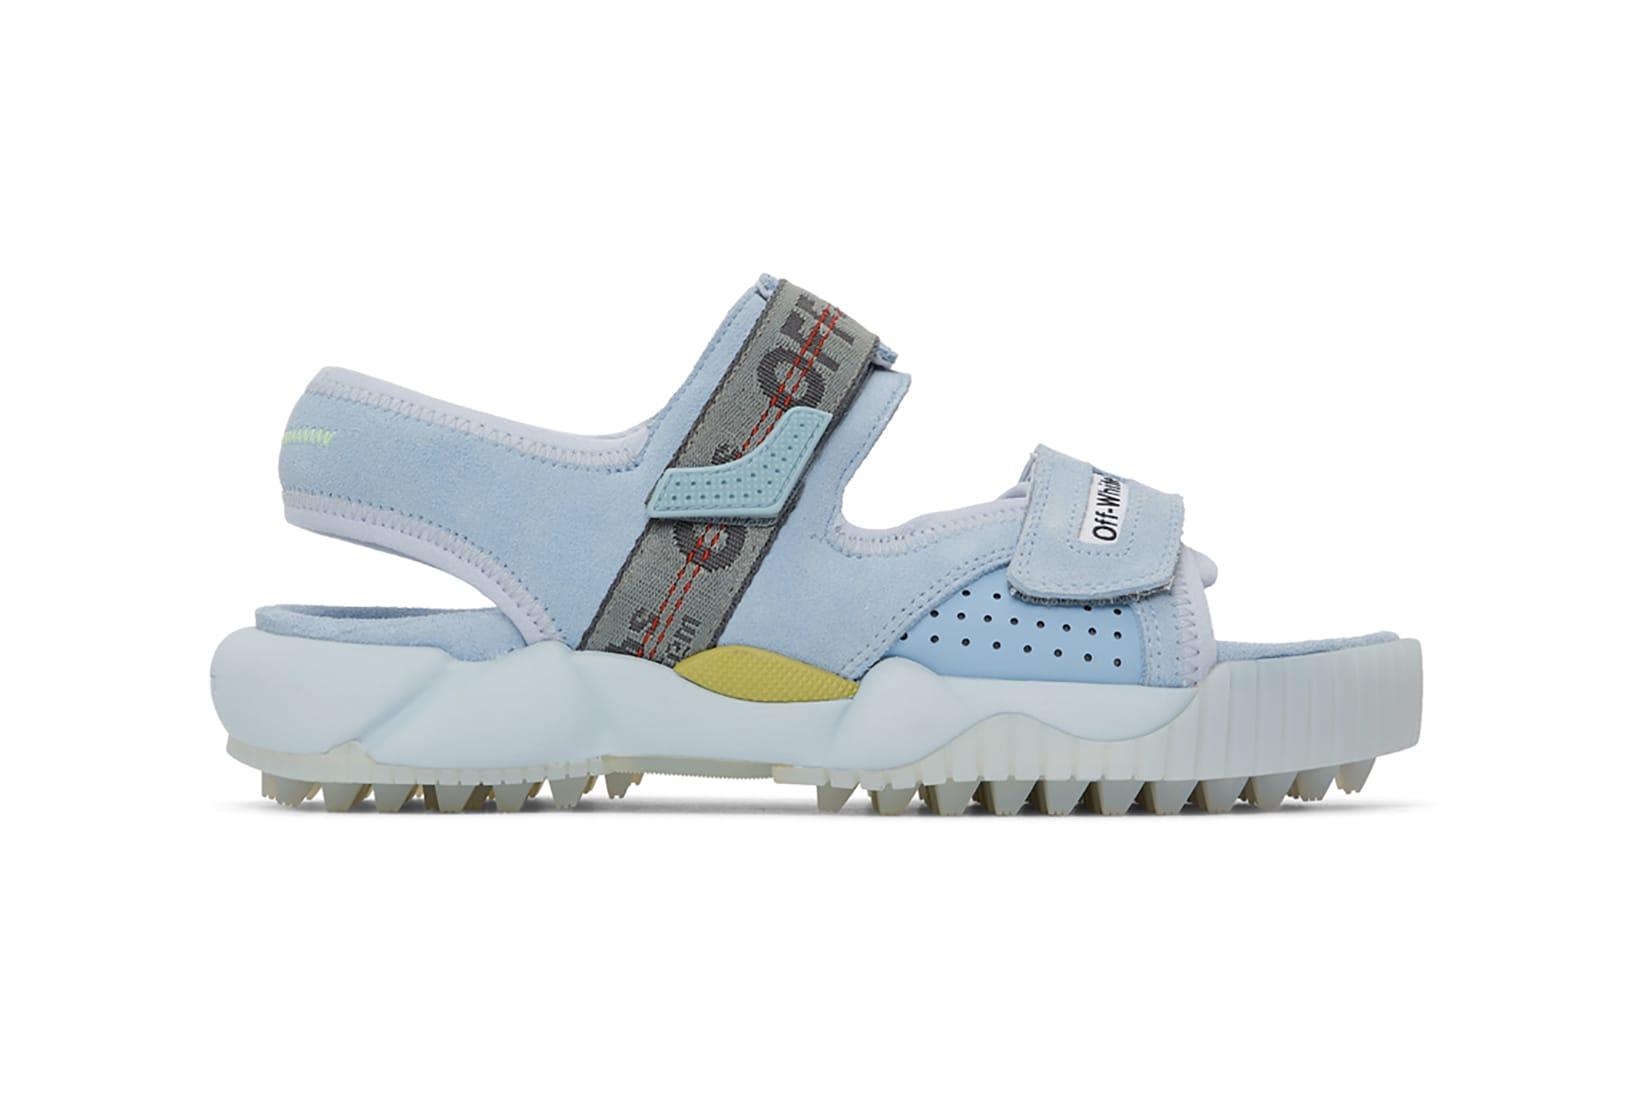 Oddsy Minimal Trekking Sandals Release